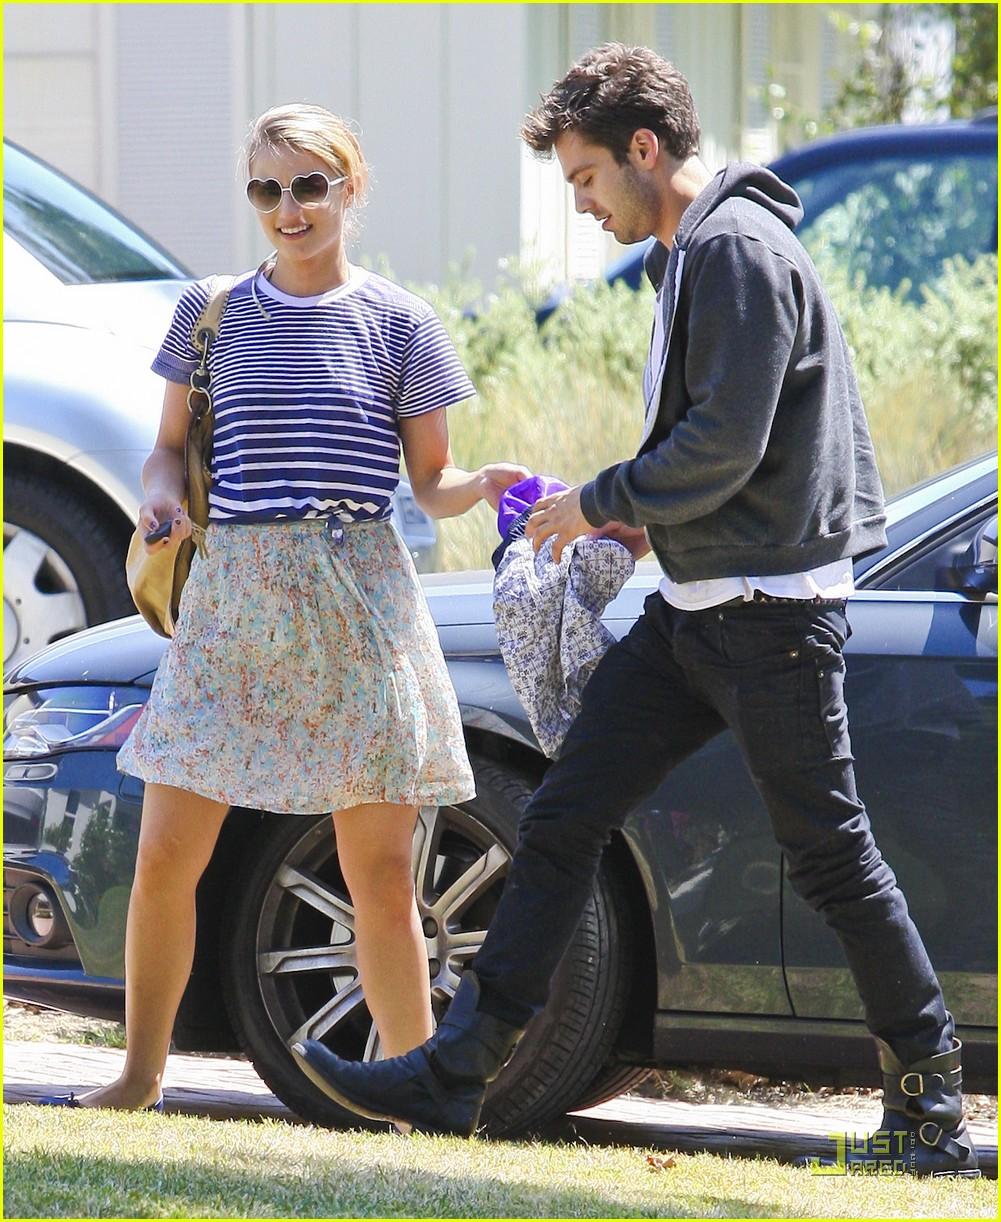 Dianna Agron with boyfriend Sebastian Stan: Saturday Sweeties!